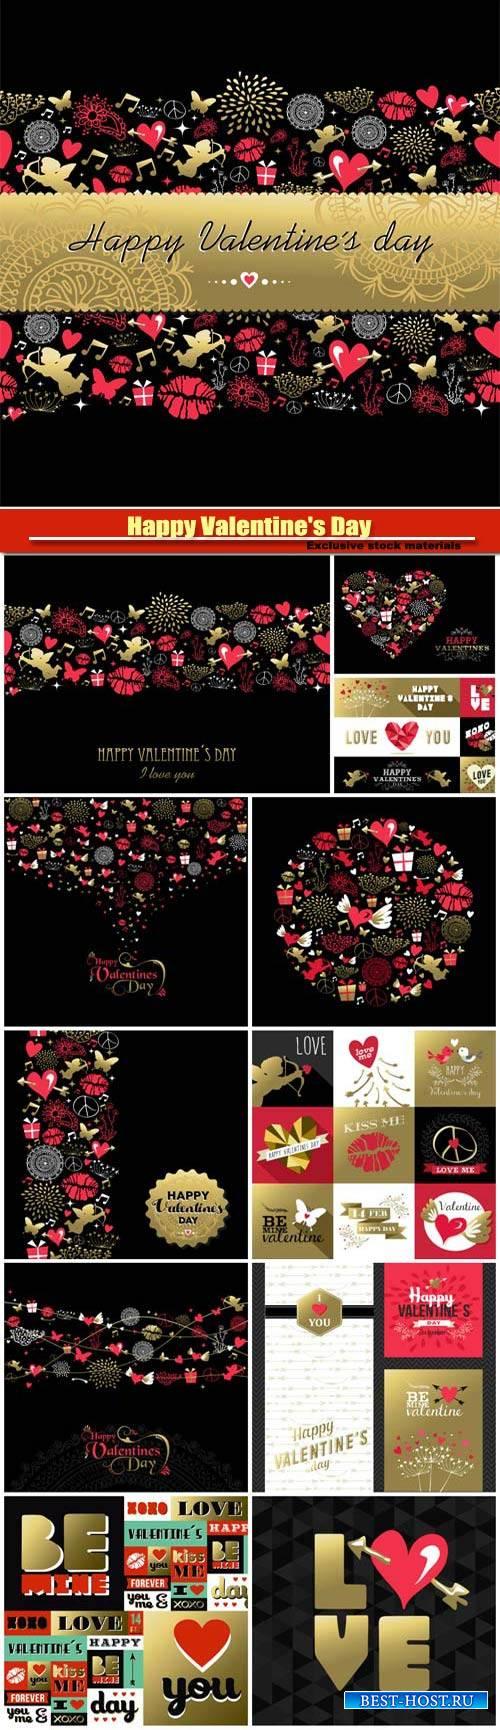 Happy Valentine's Day vector, hearts, romance, love